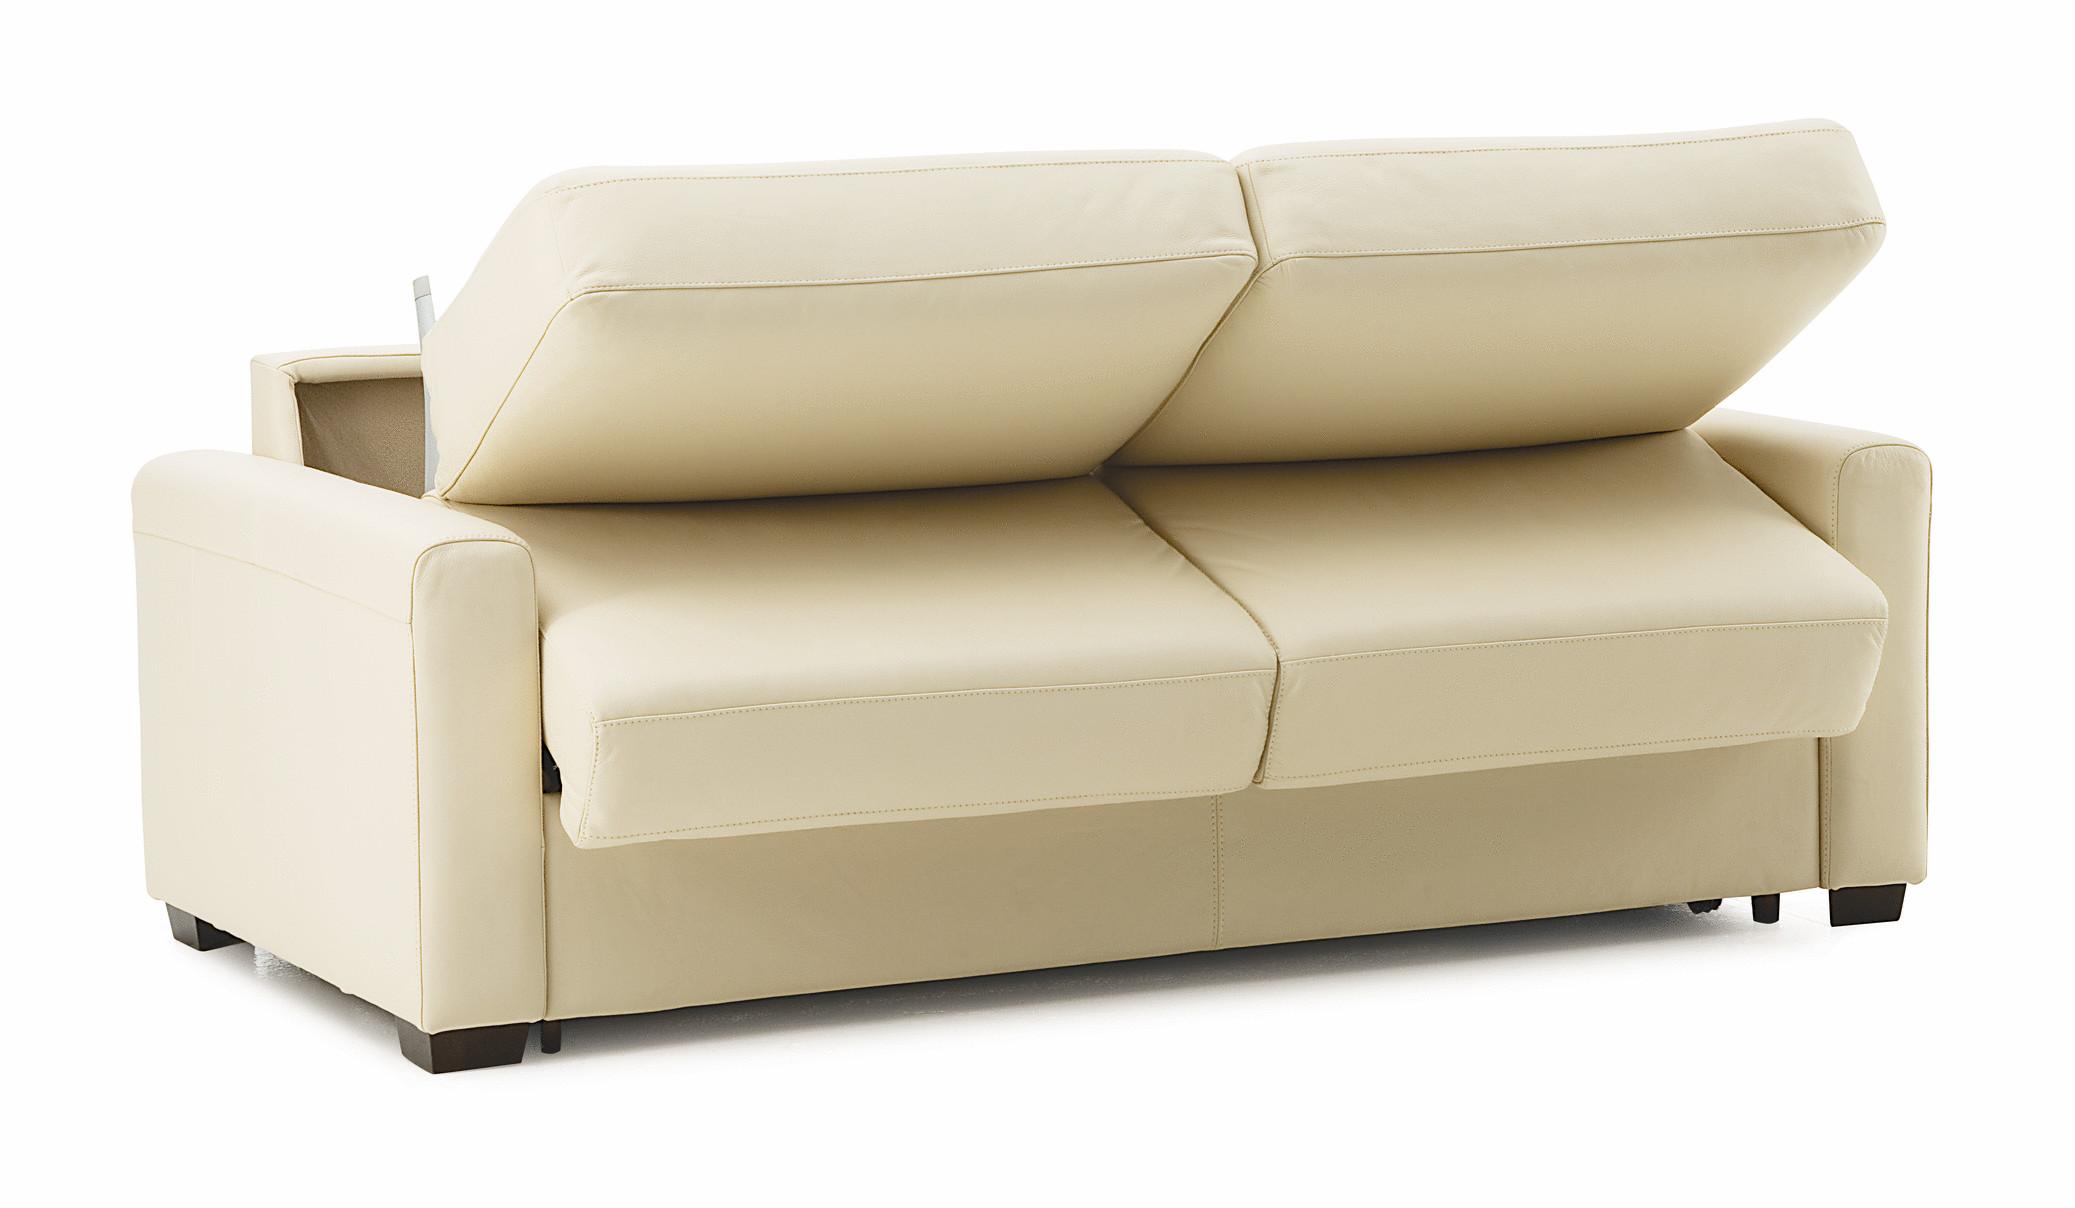 Sofa beds adorable used sofa bed 25 ikea friheten gray BDCZYMN